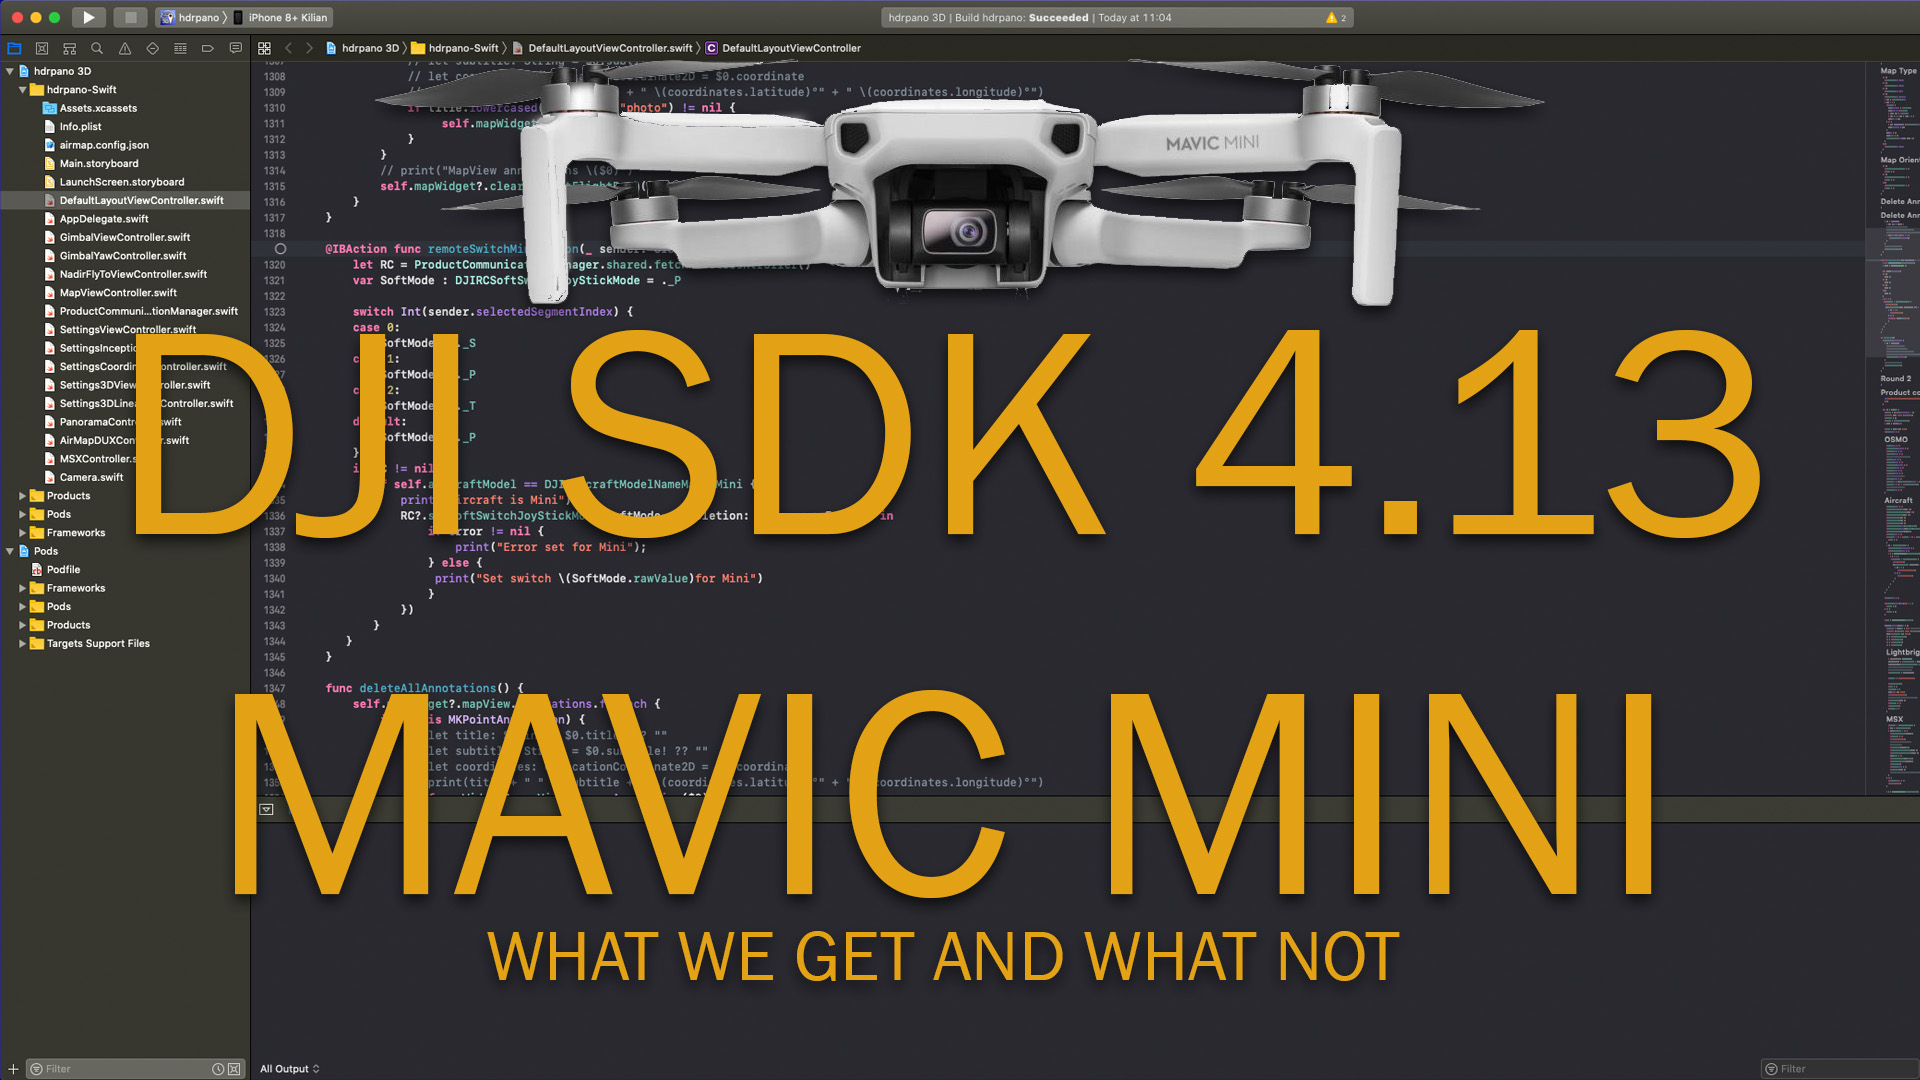 SDK 4.13